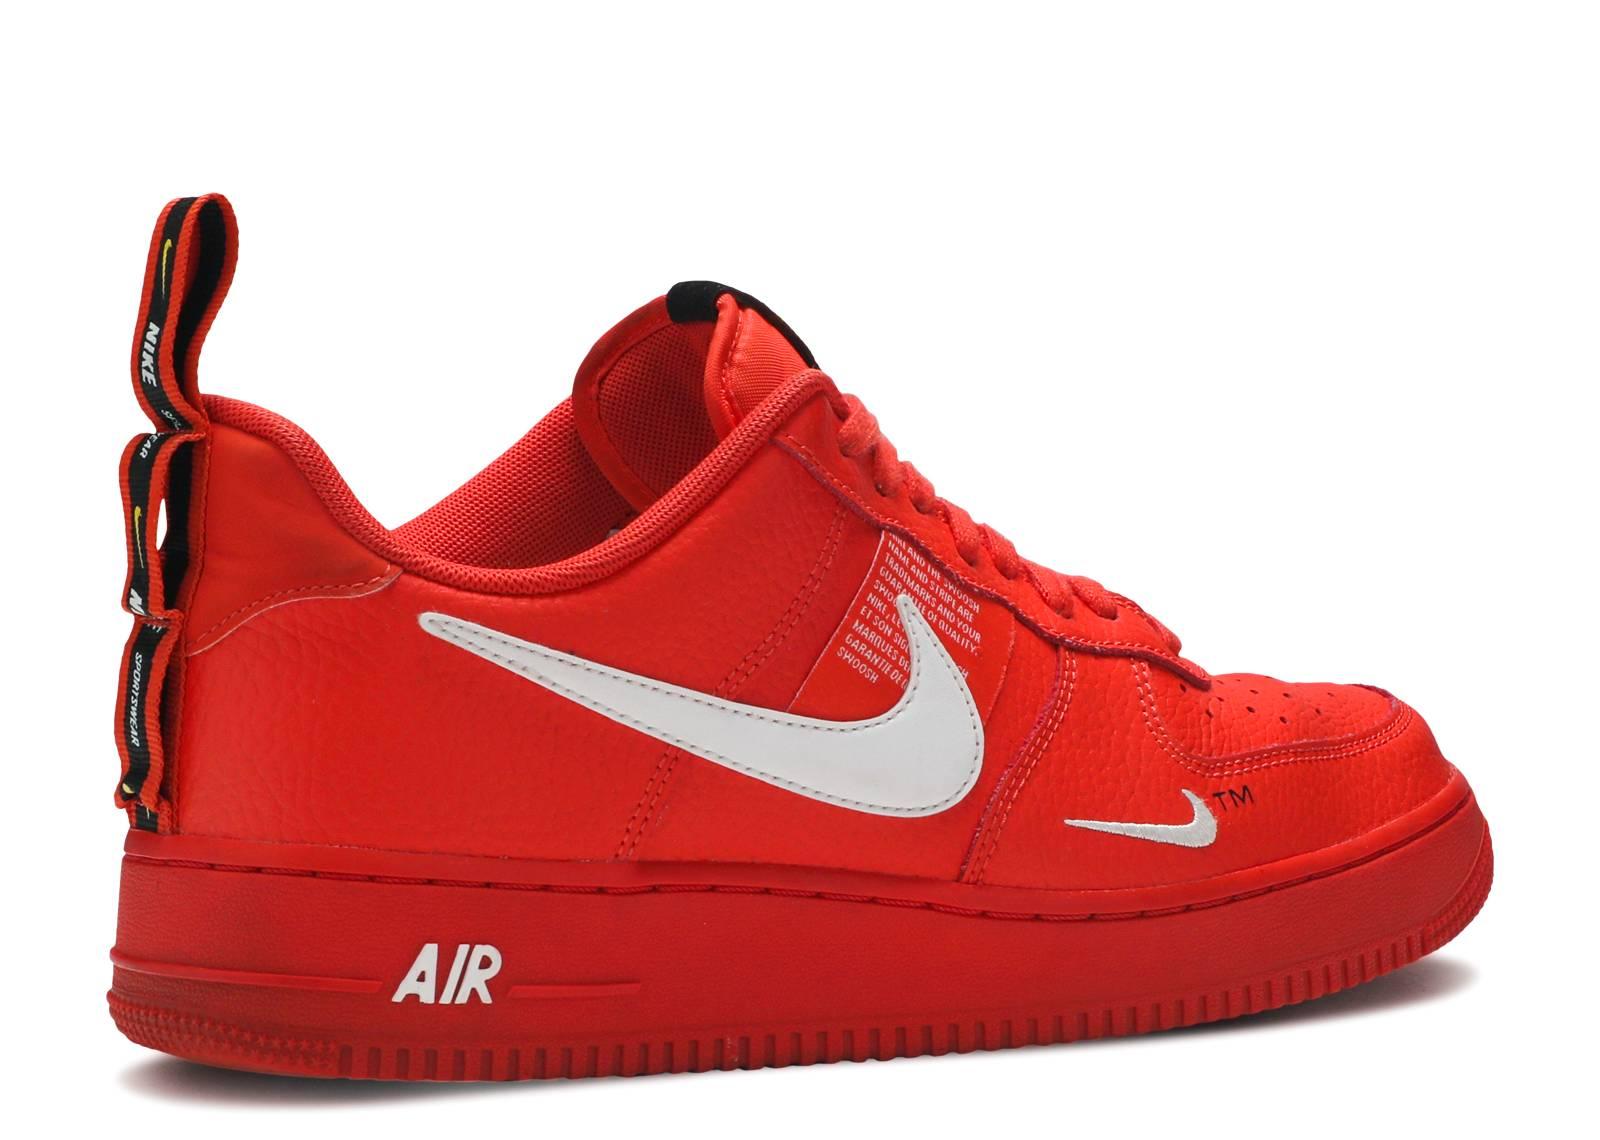 878c420089b Air Force 1  07 Lv8 Utility - Nike - aj7747 800 - team orange white-black